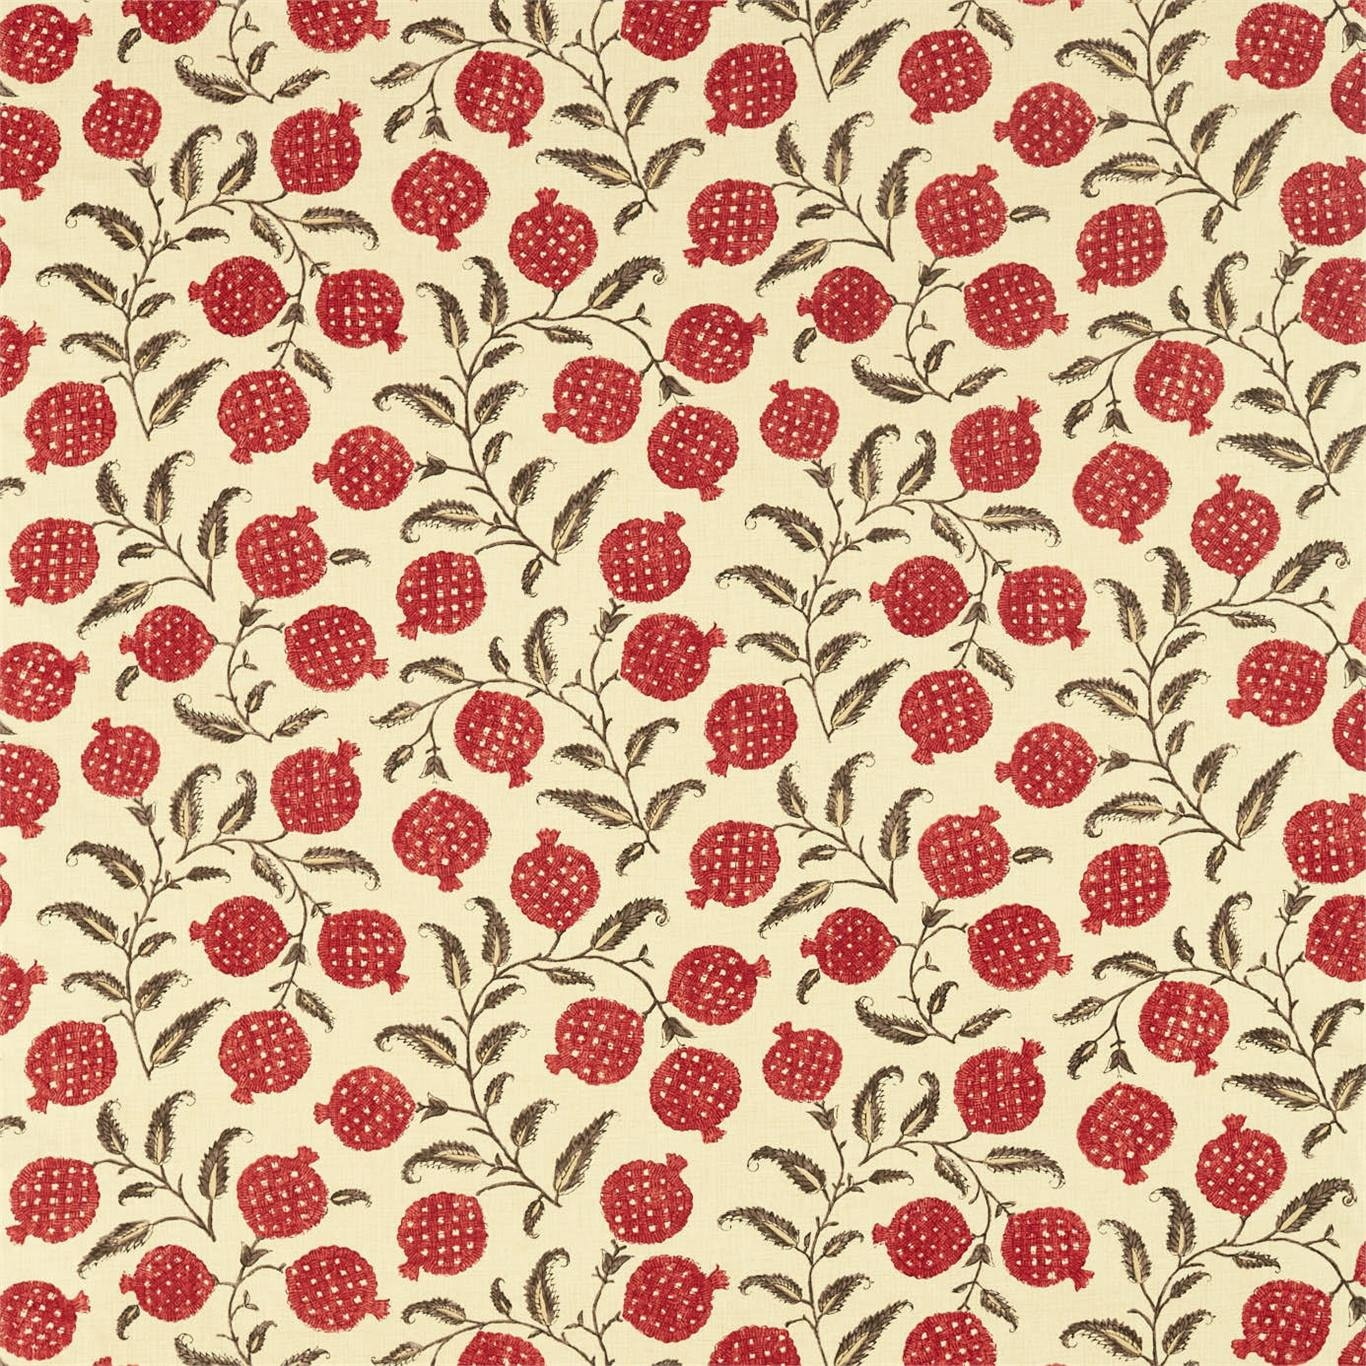 Image of Sanderson Anaar Madder Fabric 226627